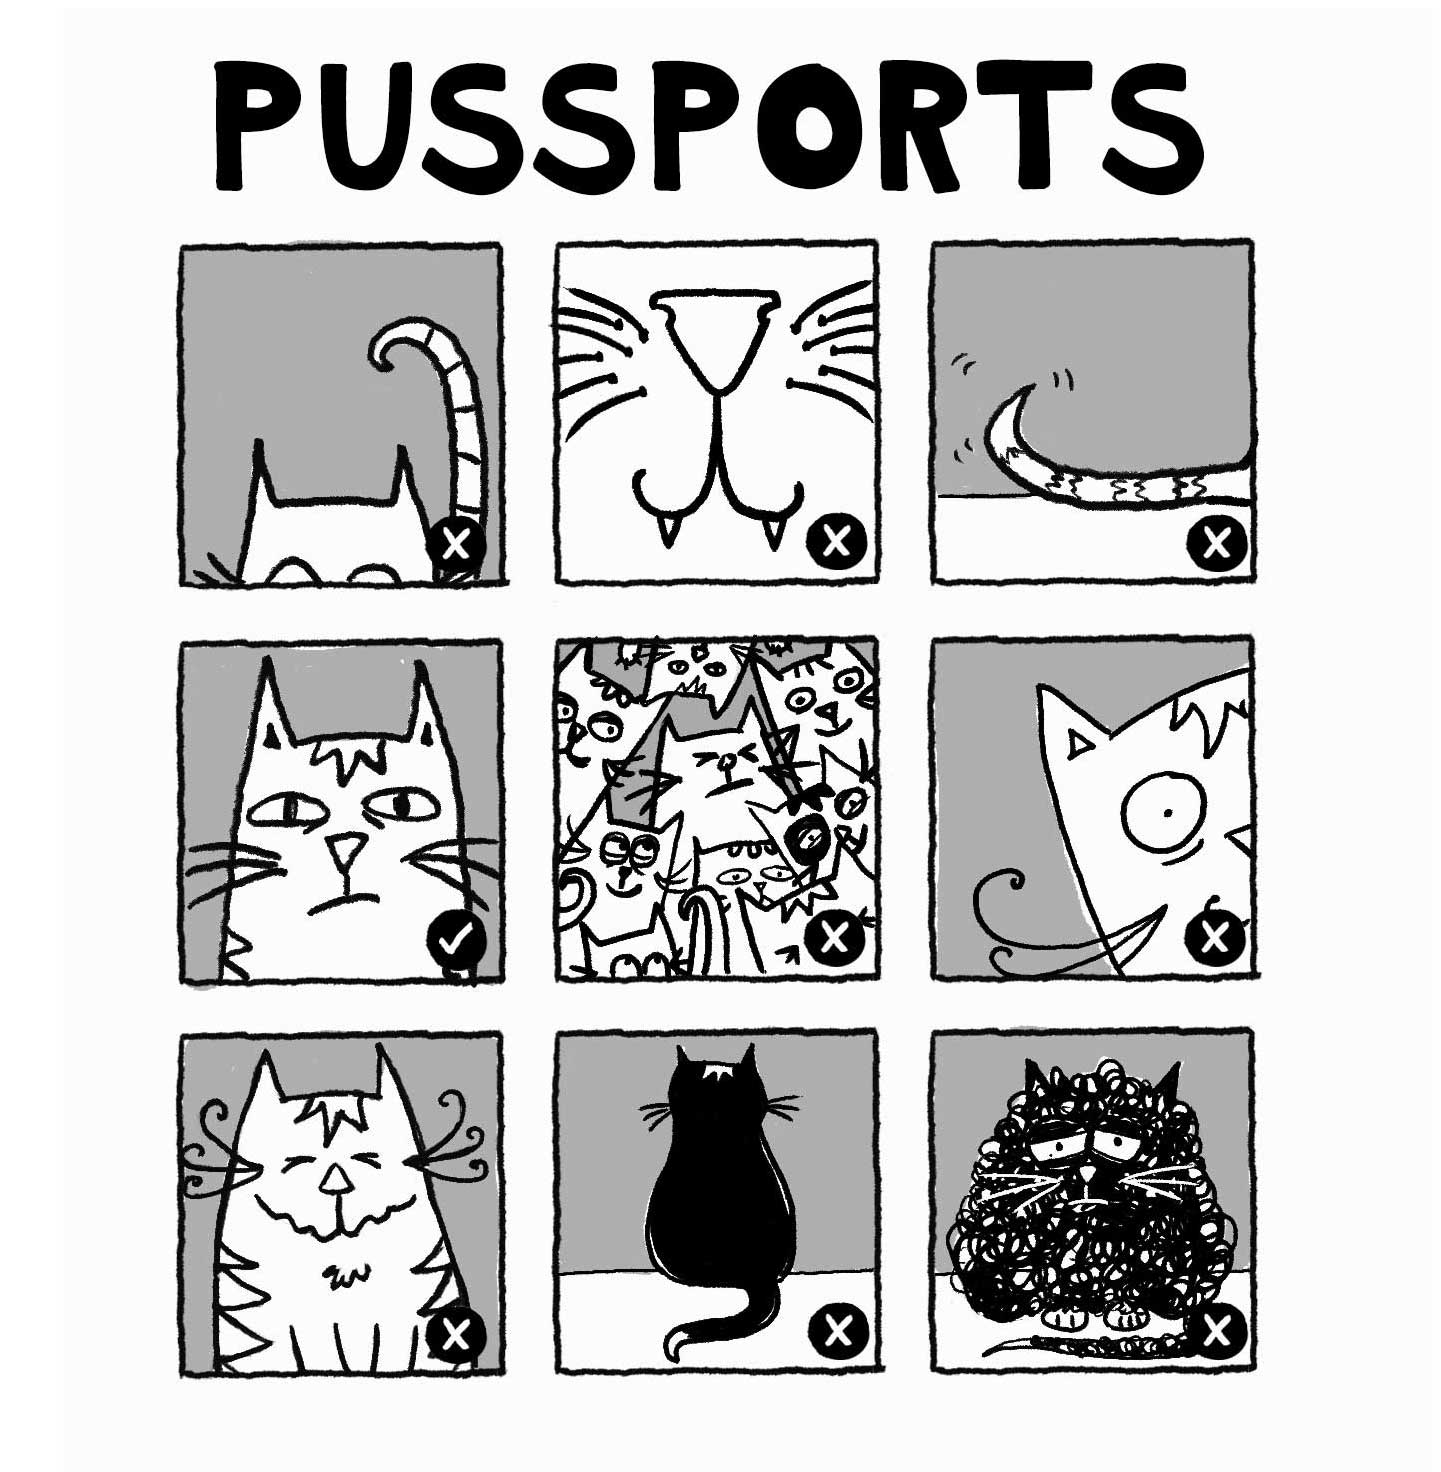 Pussports_square.jpg